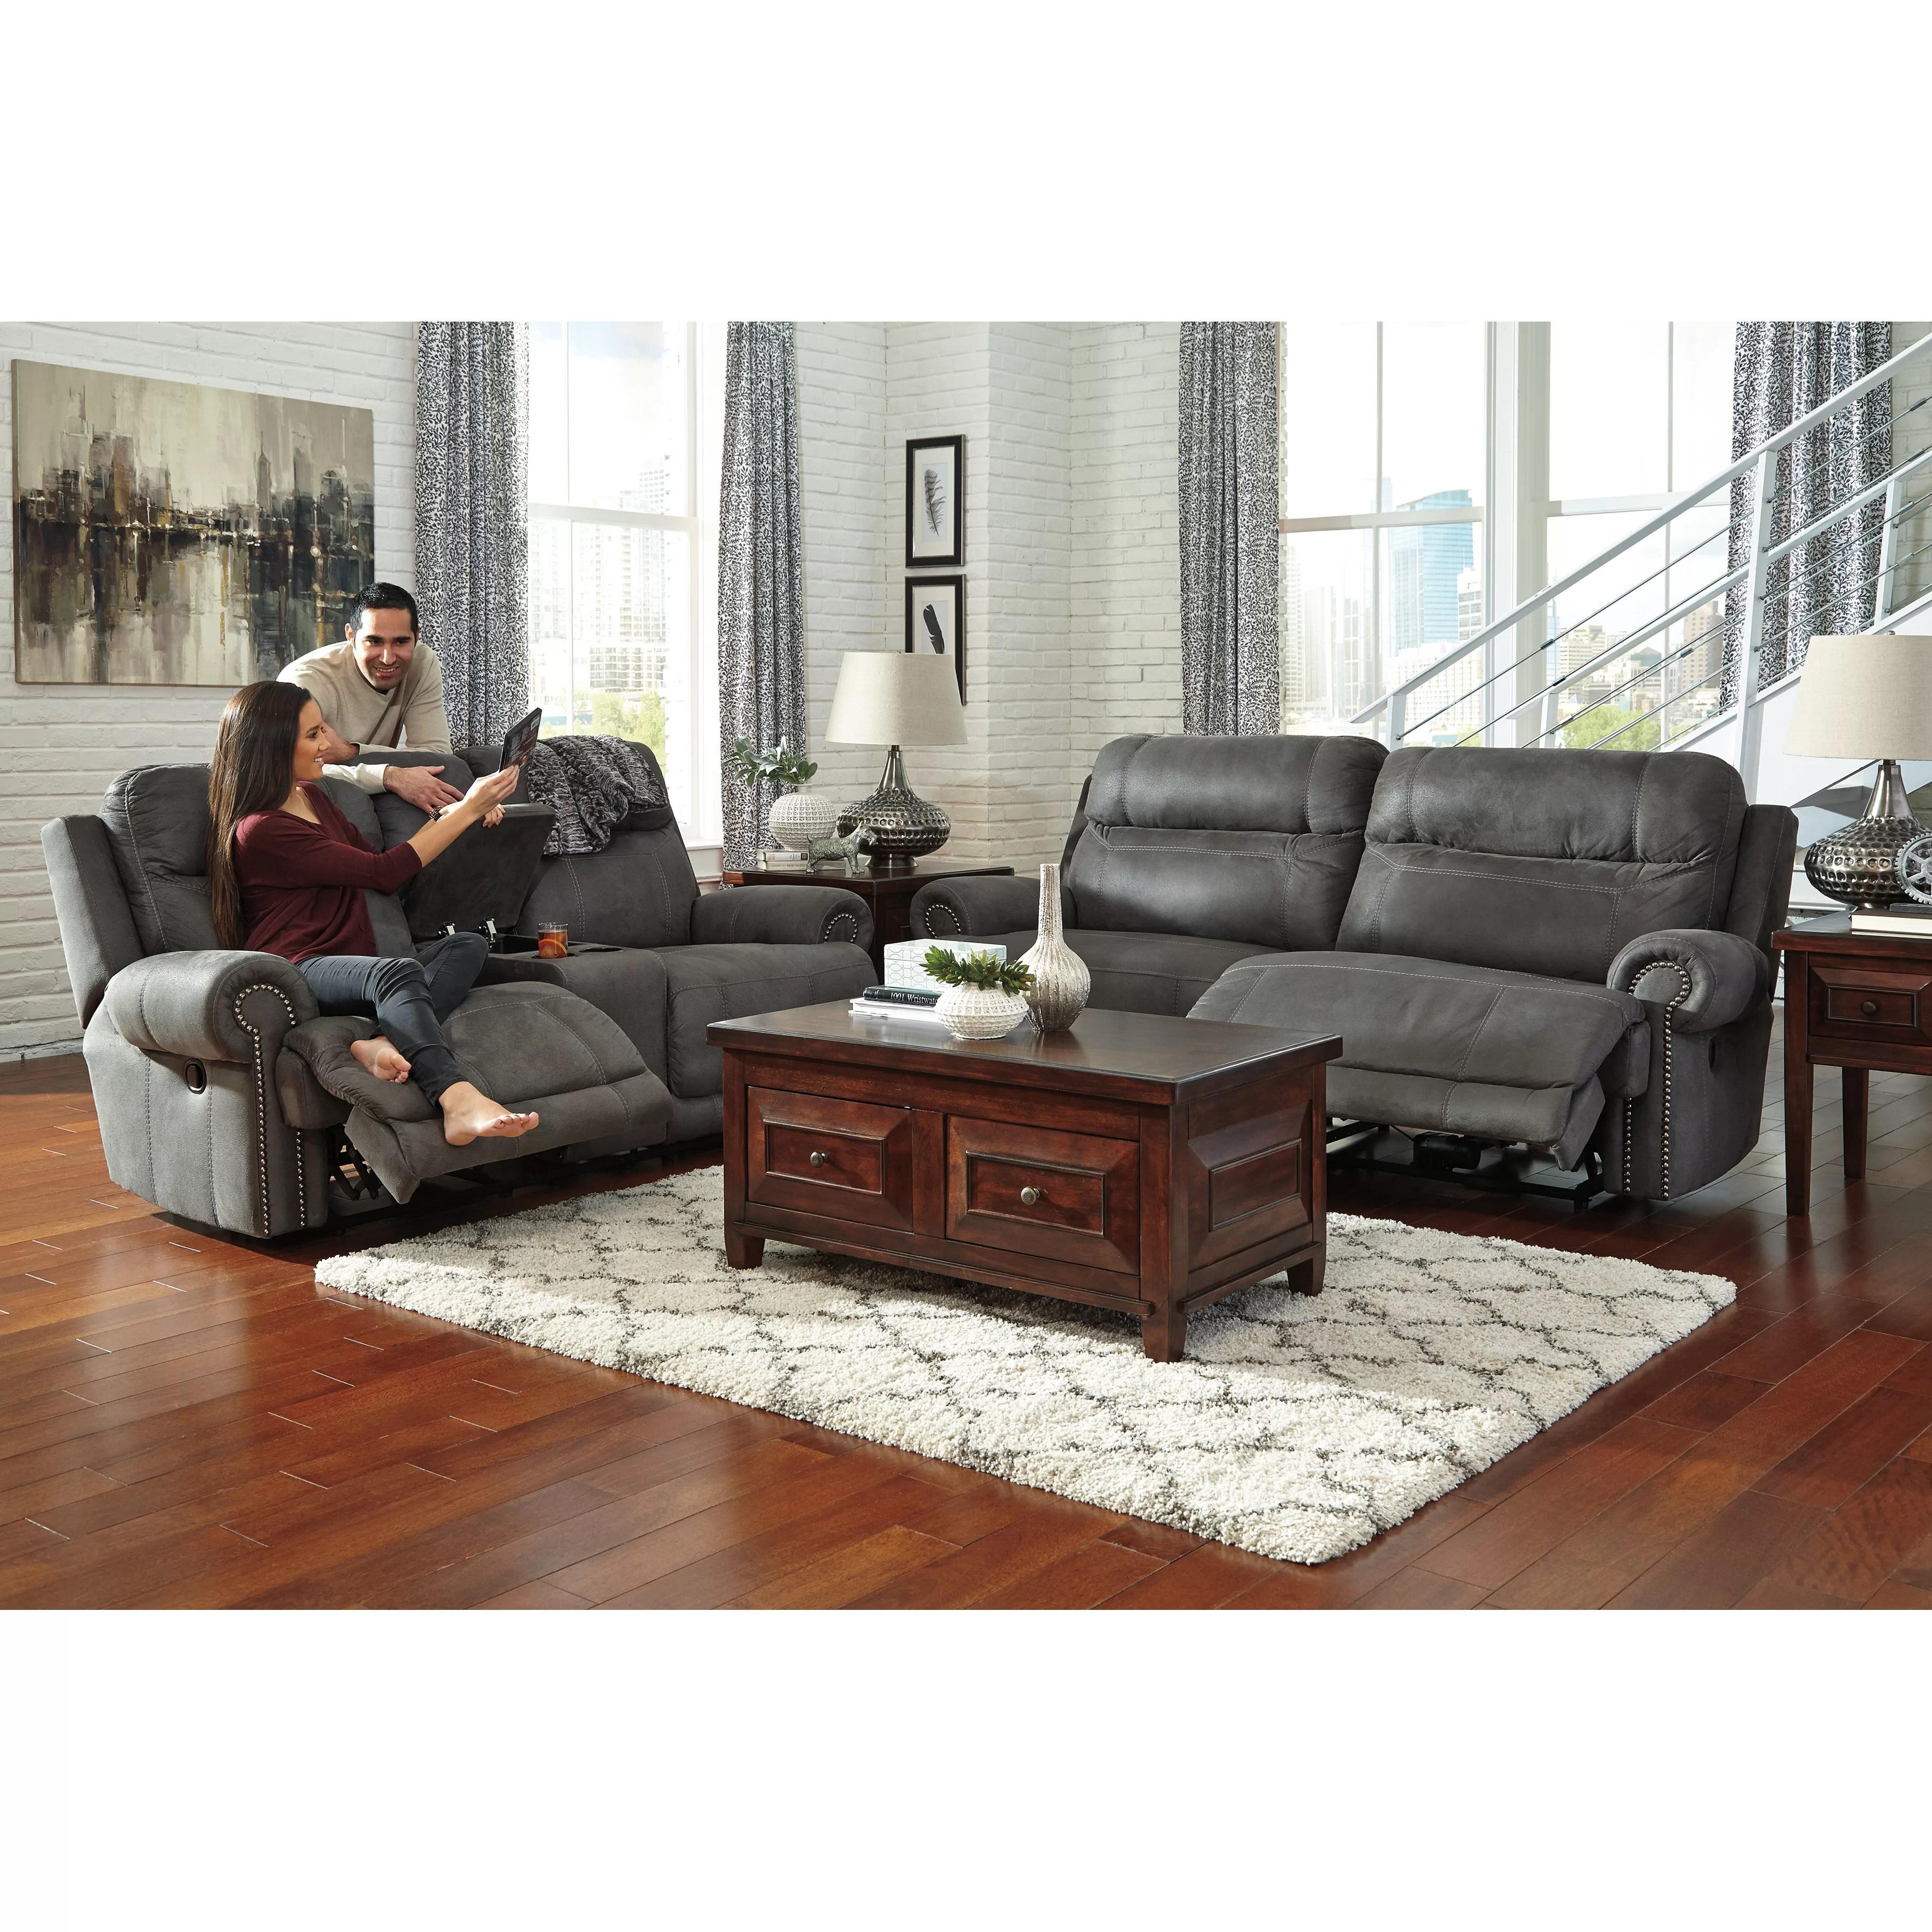 signature design by ashley harvest sleeper sofa ara futon bed with storage hazelnut austere 2 seat reclining wayfair